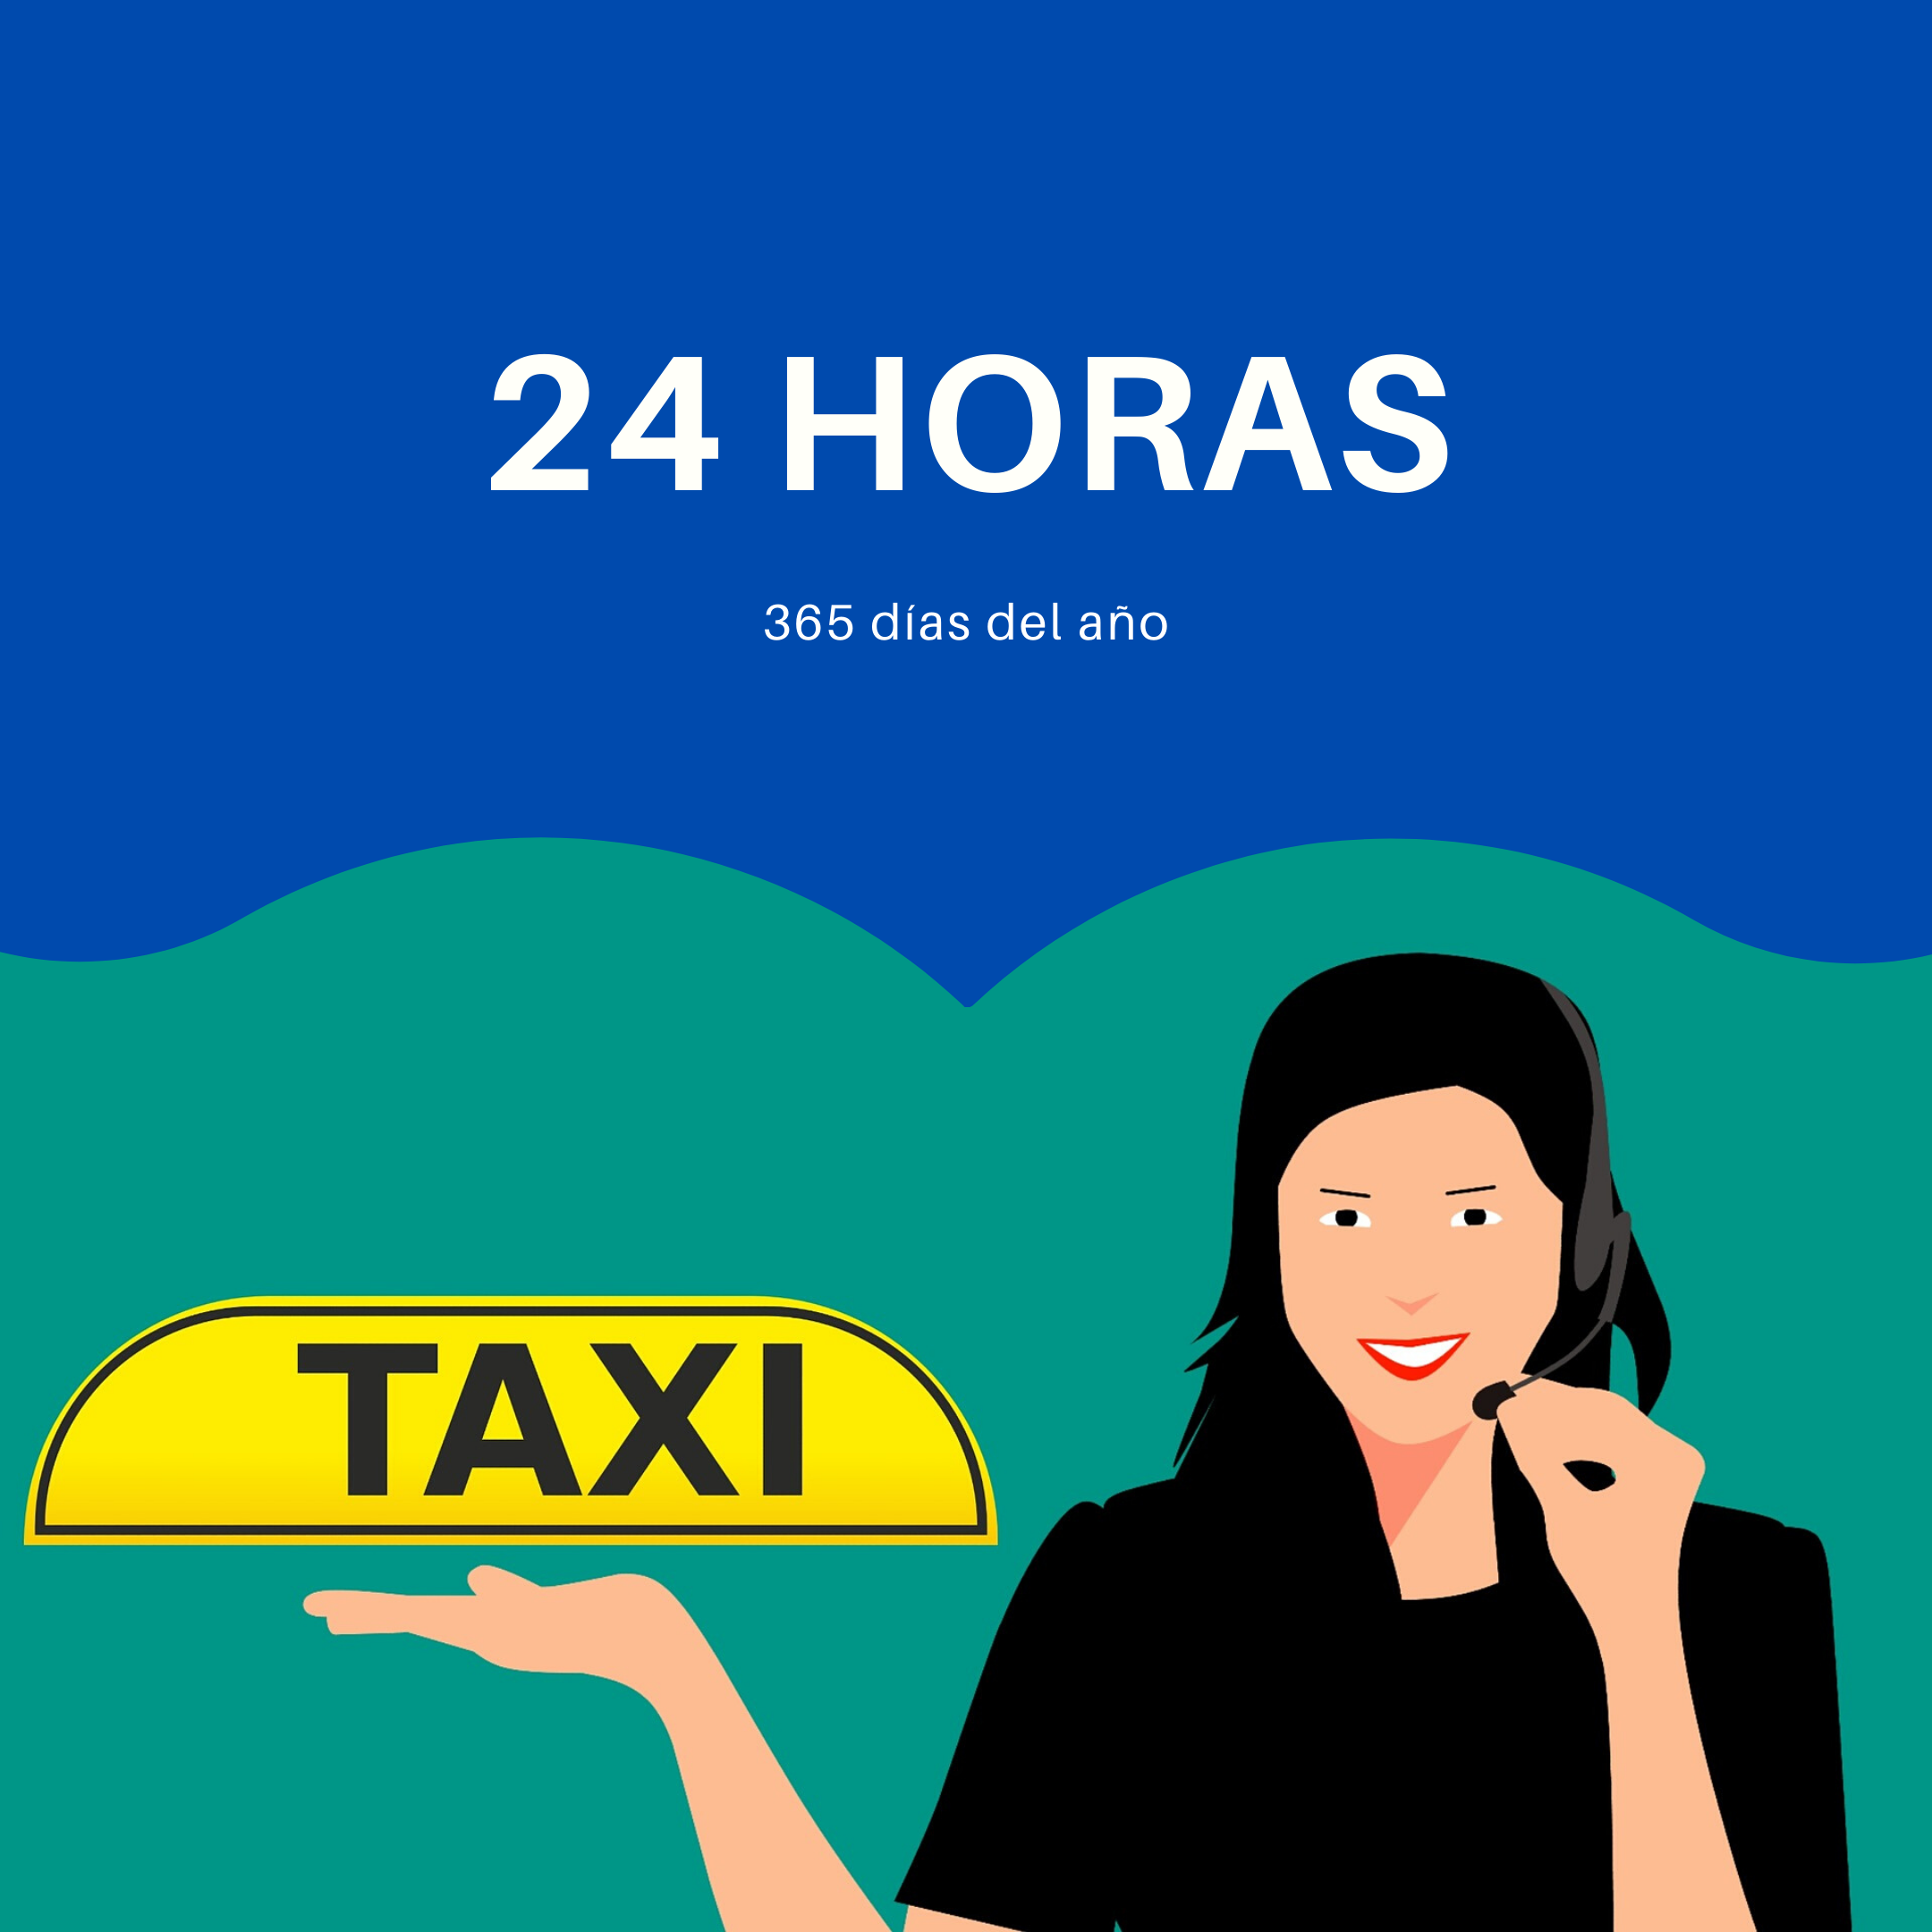 Taxi 24 horas en Calonge